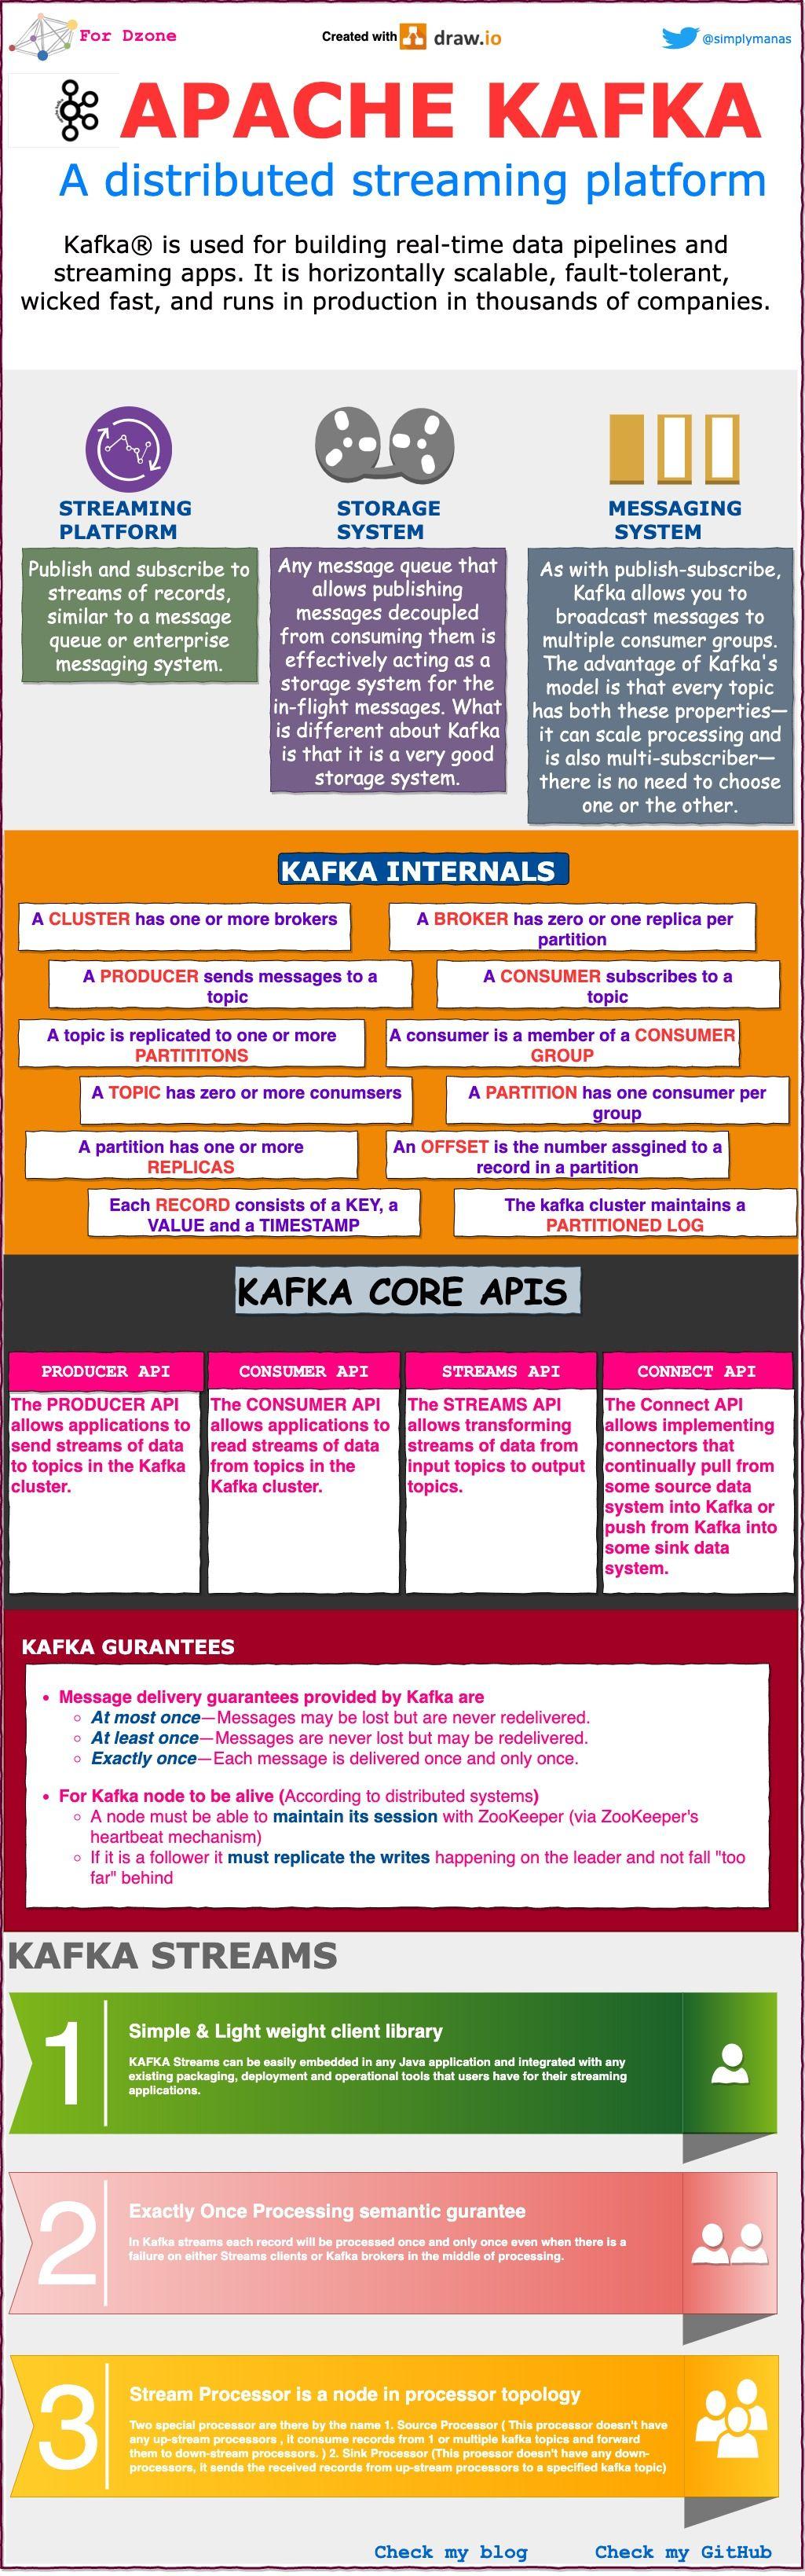 Infographic on Apache Kafka DZone Integration in 2020